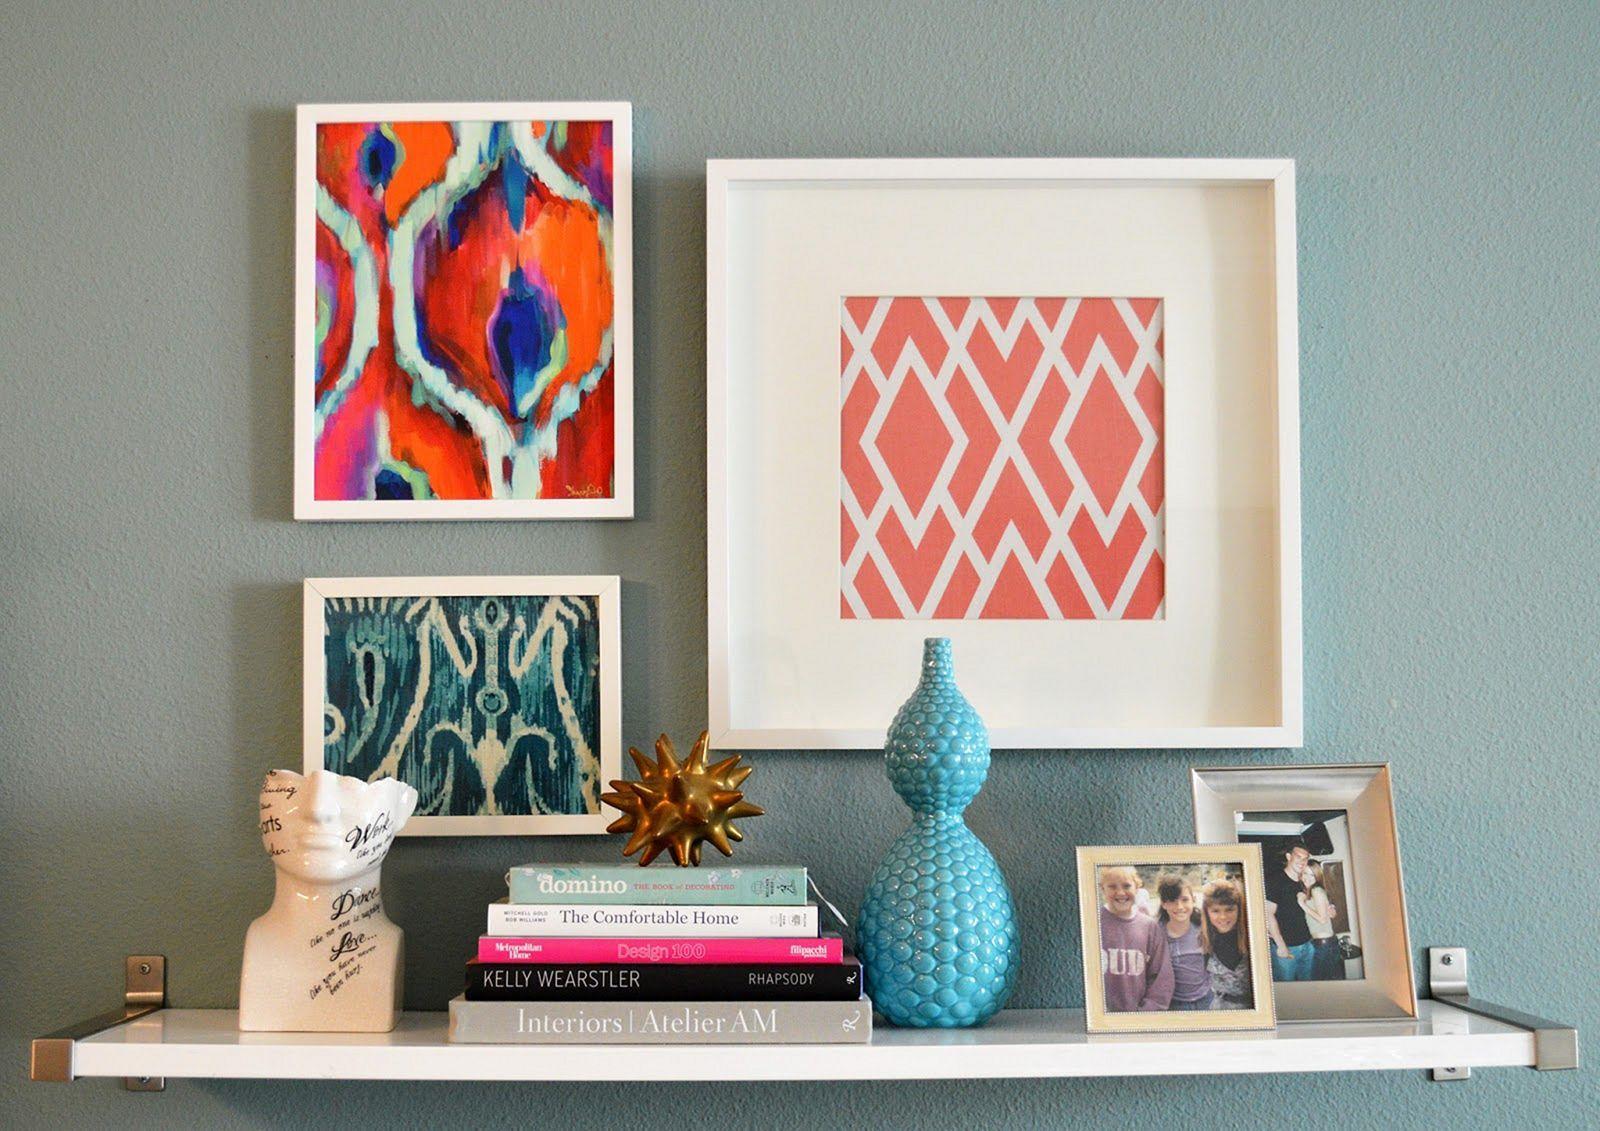 25 Most Beautiful Wall Decoration Ideas To Make Home Interior Freshouz Com Decor Bedroom Pinterest Framed Fabric